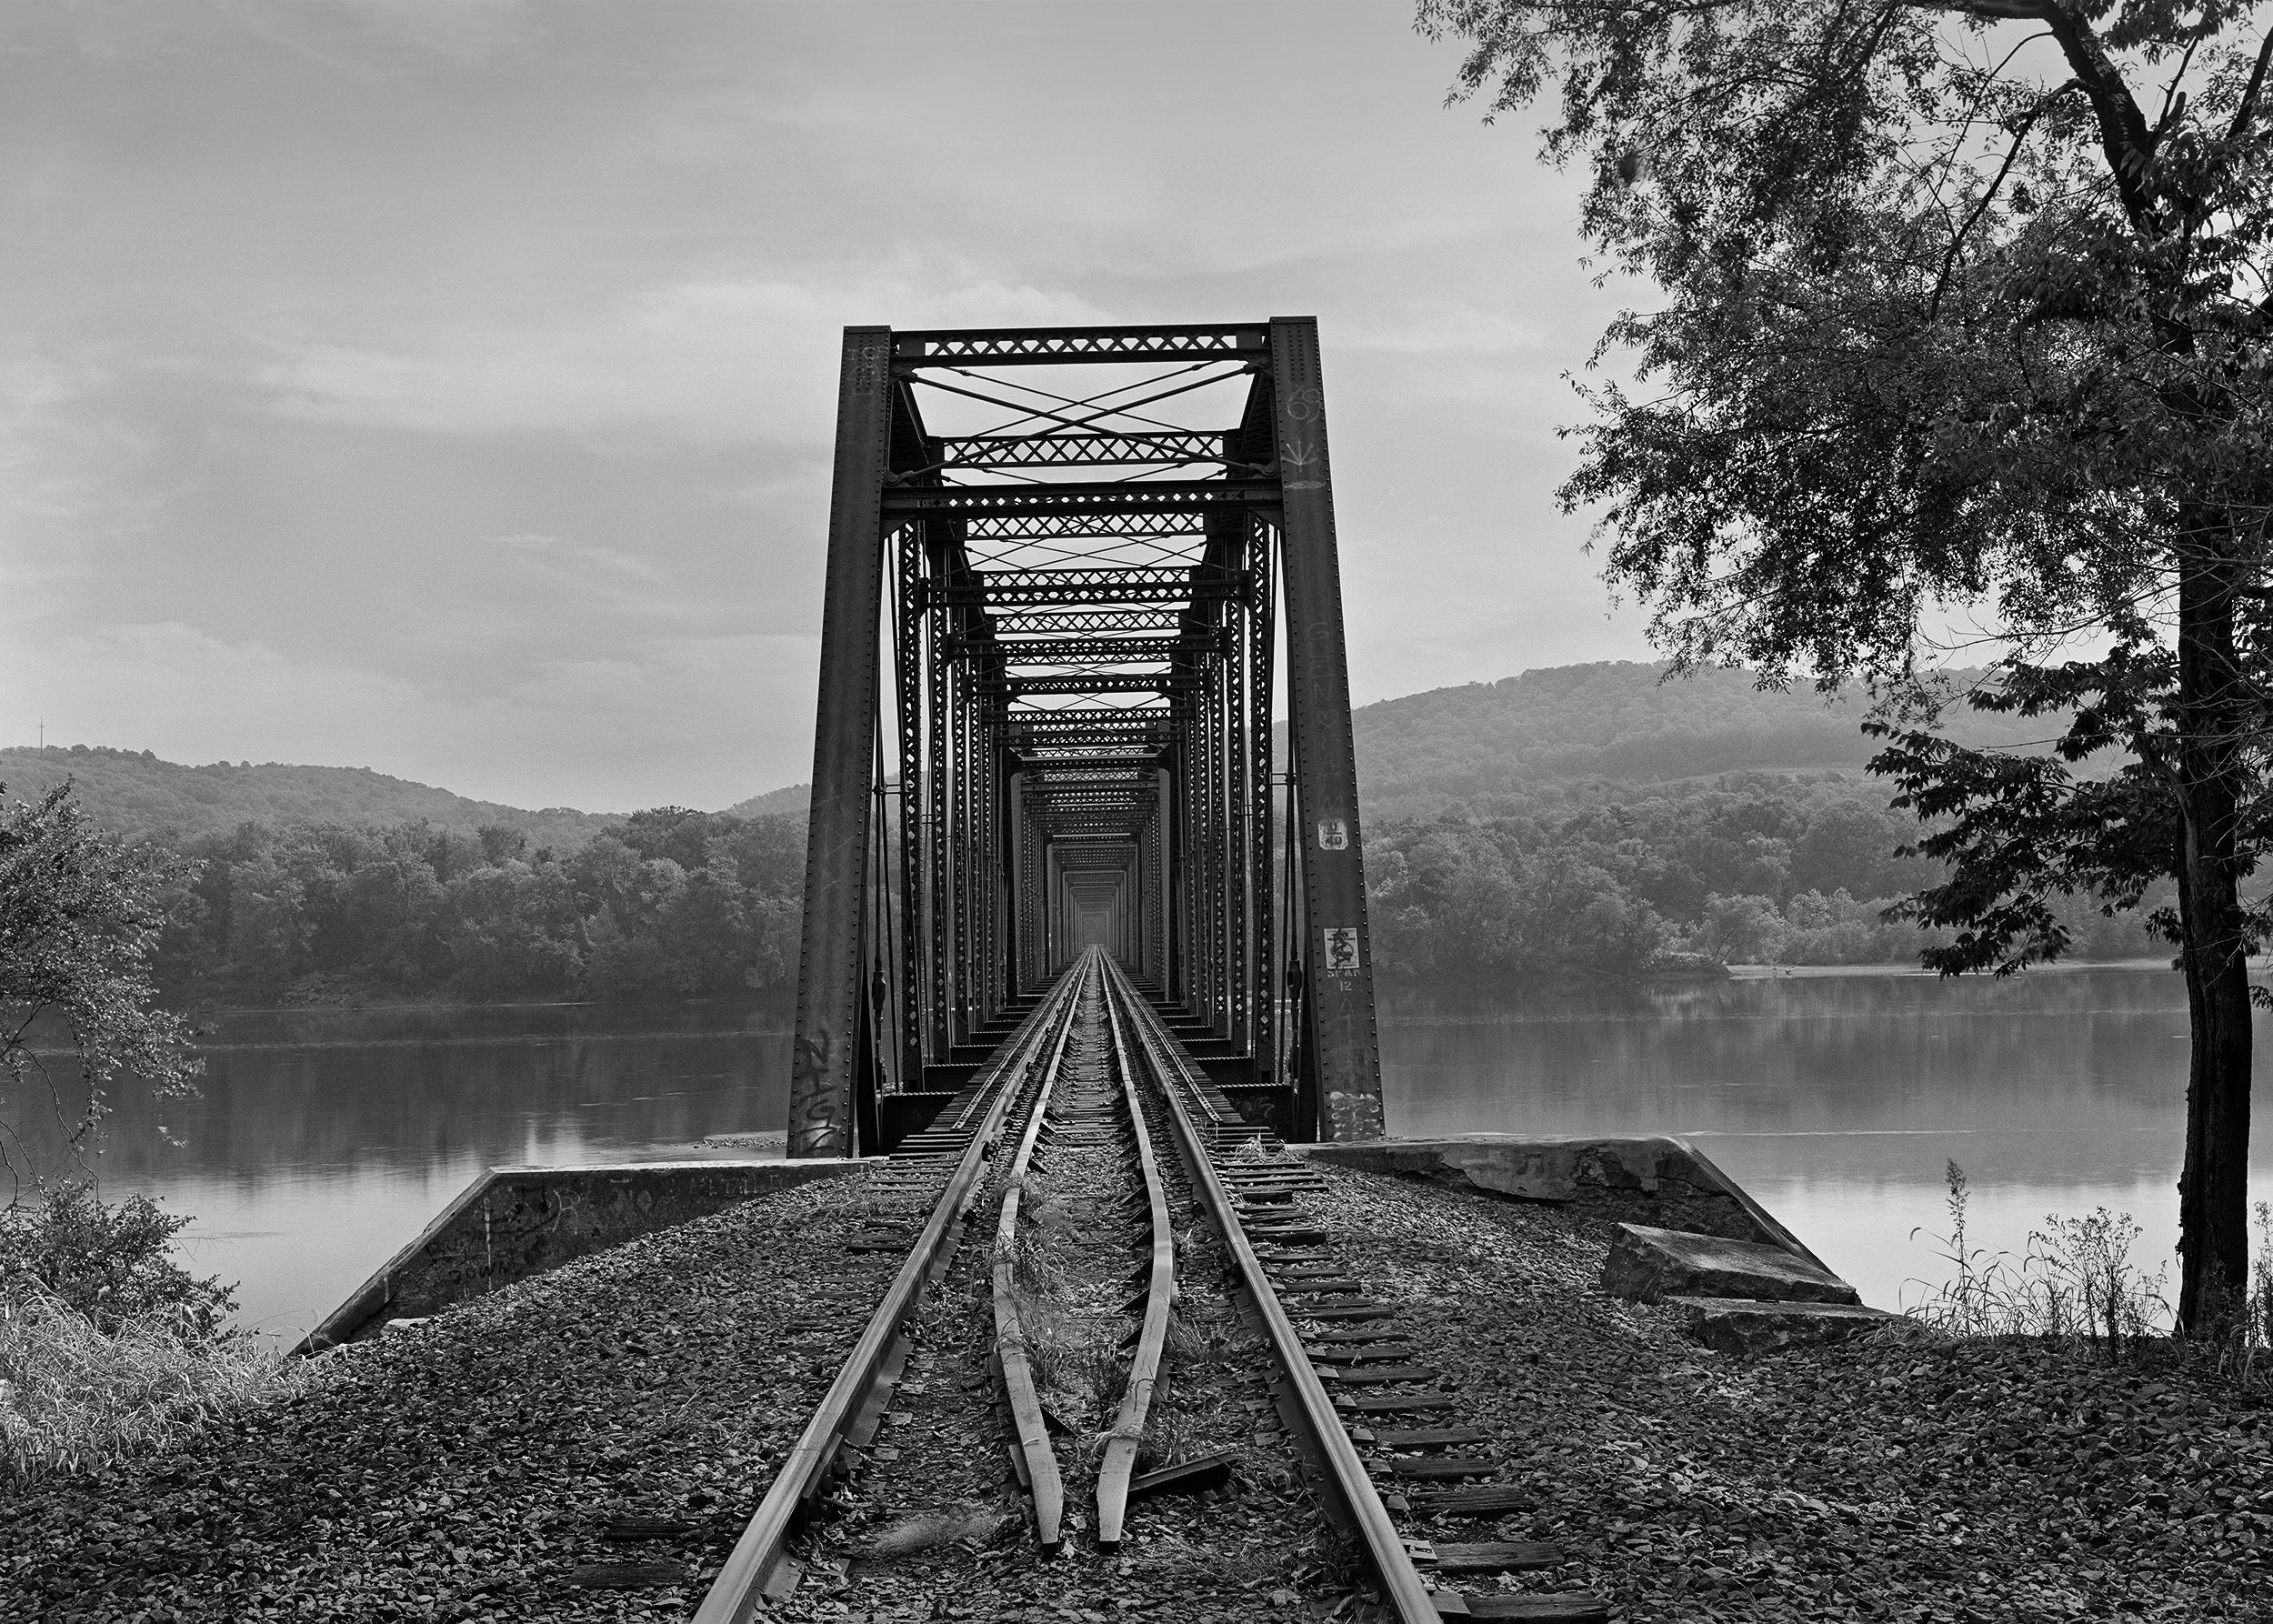 Pratt Truss Bridge, Susquehanna River, Selinsgrove, PA